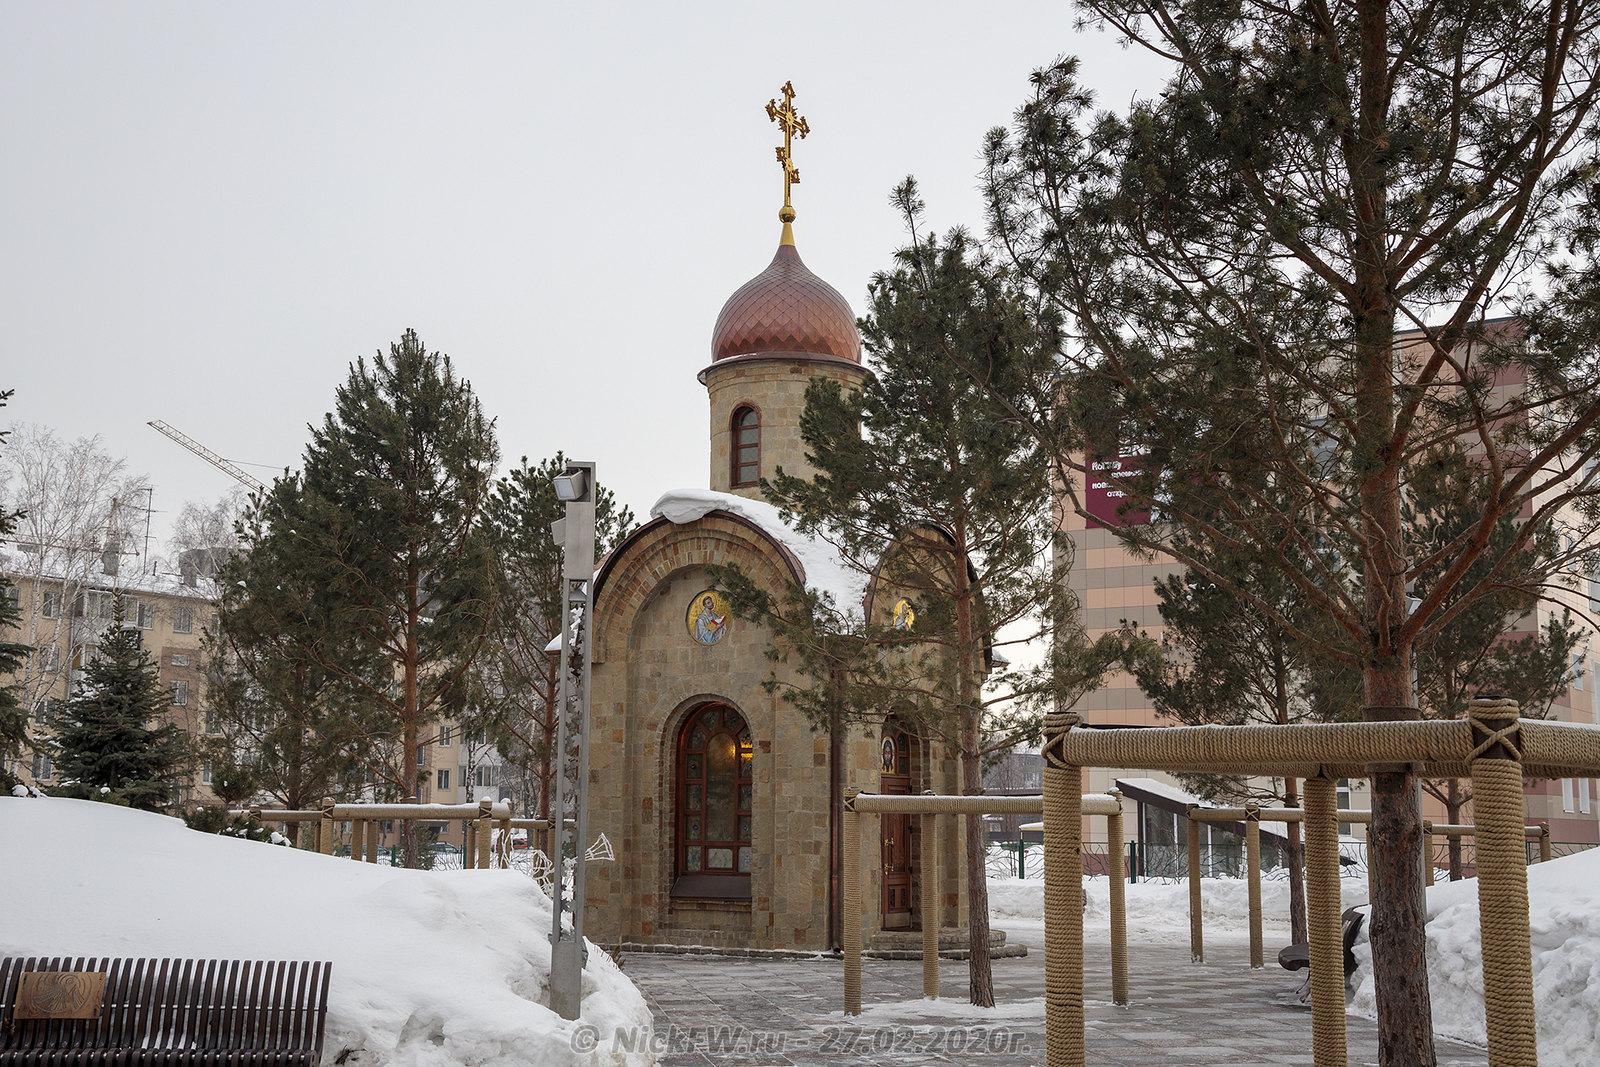 11. Часовня - Парк Ангелов © NickFW.ru - 27.02.2020г.